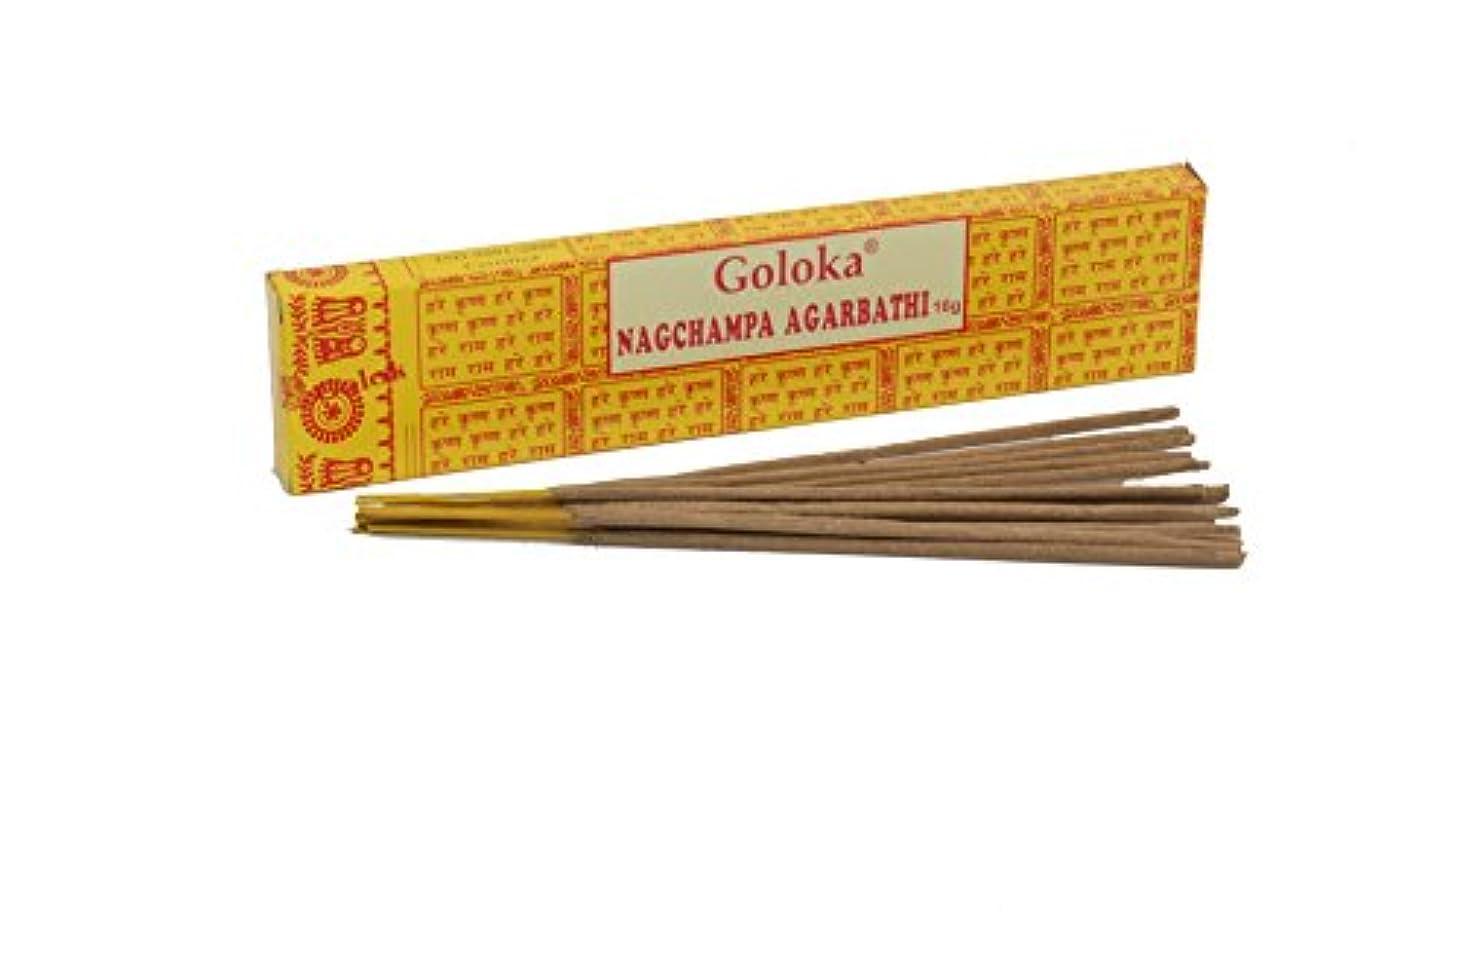 売上高穴自己Goloka Nag Champa Incense Sticks by Goloka